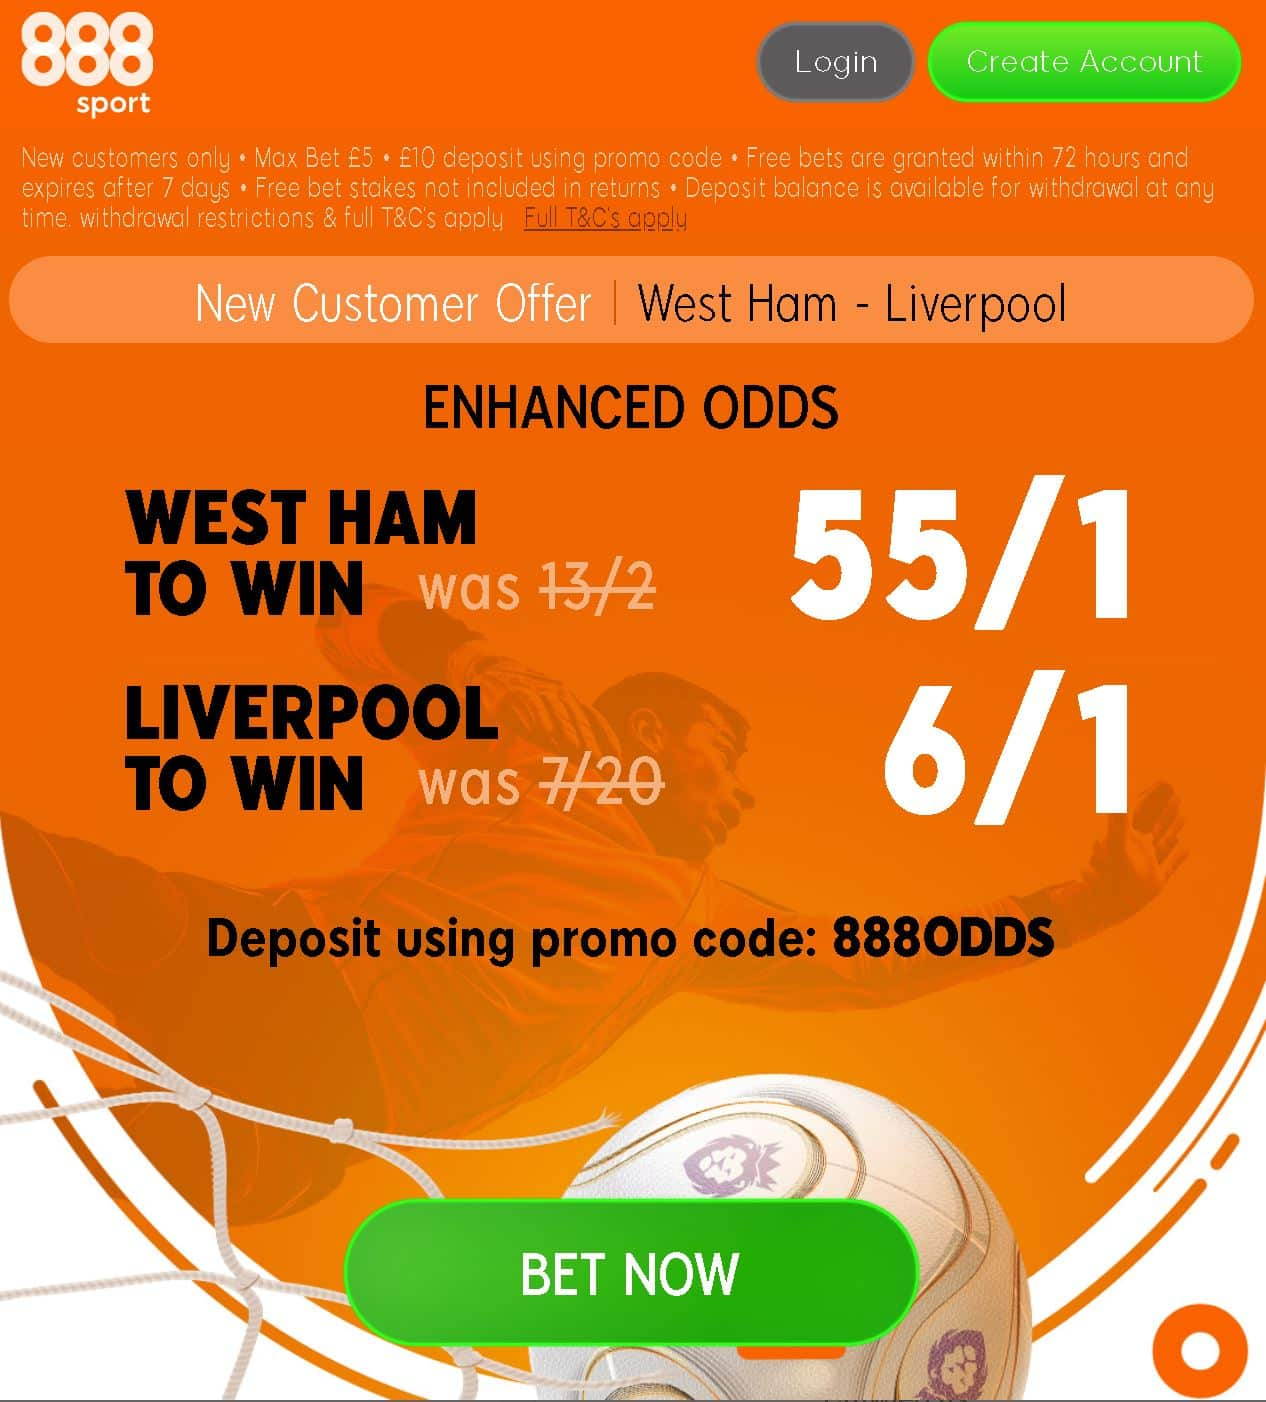 West Ham vs Liverpool odds